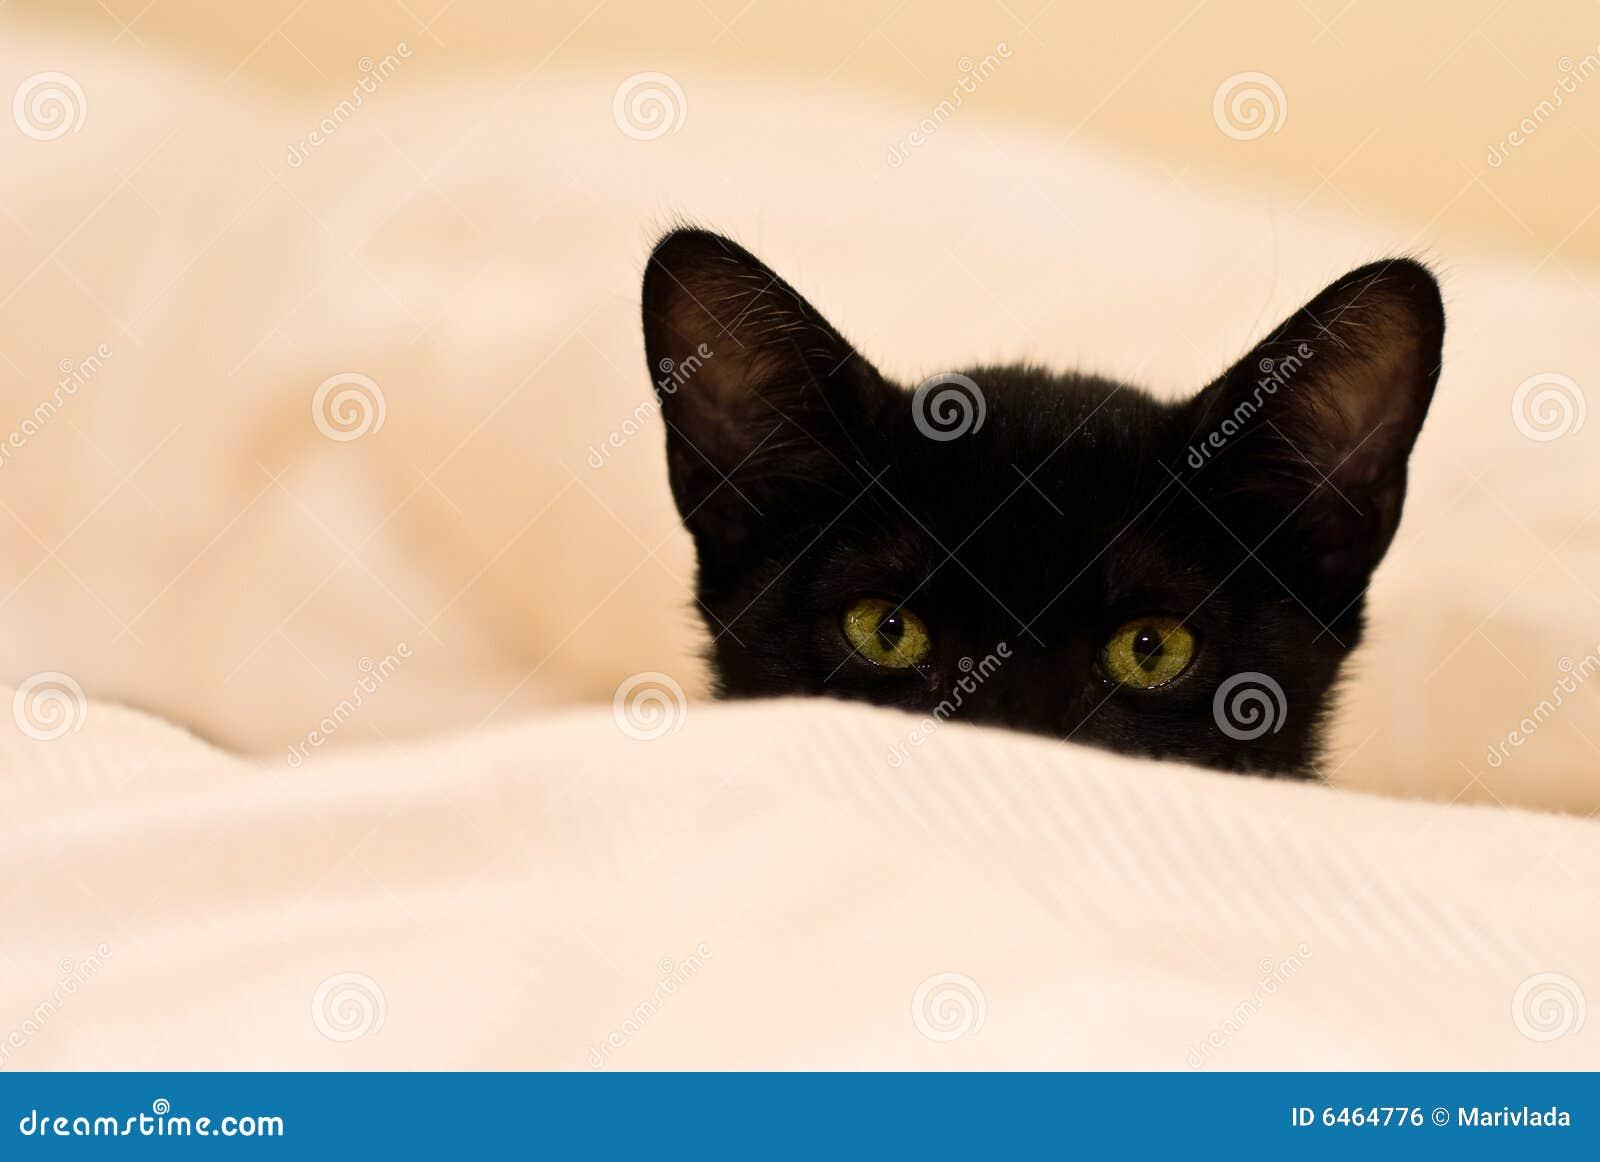 Czarne oko zielone kociak mała